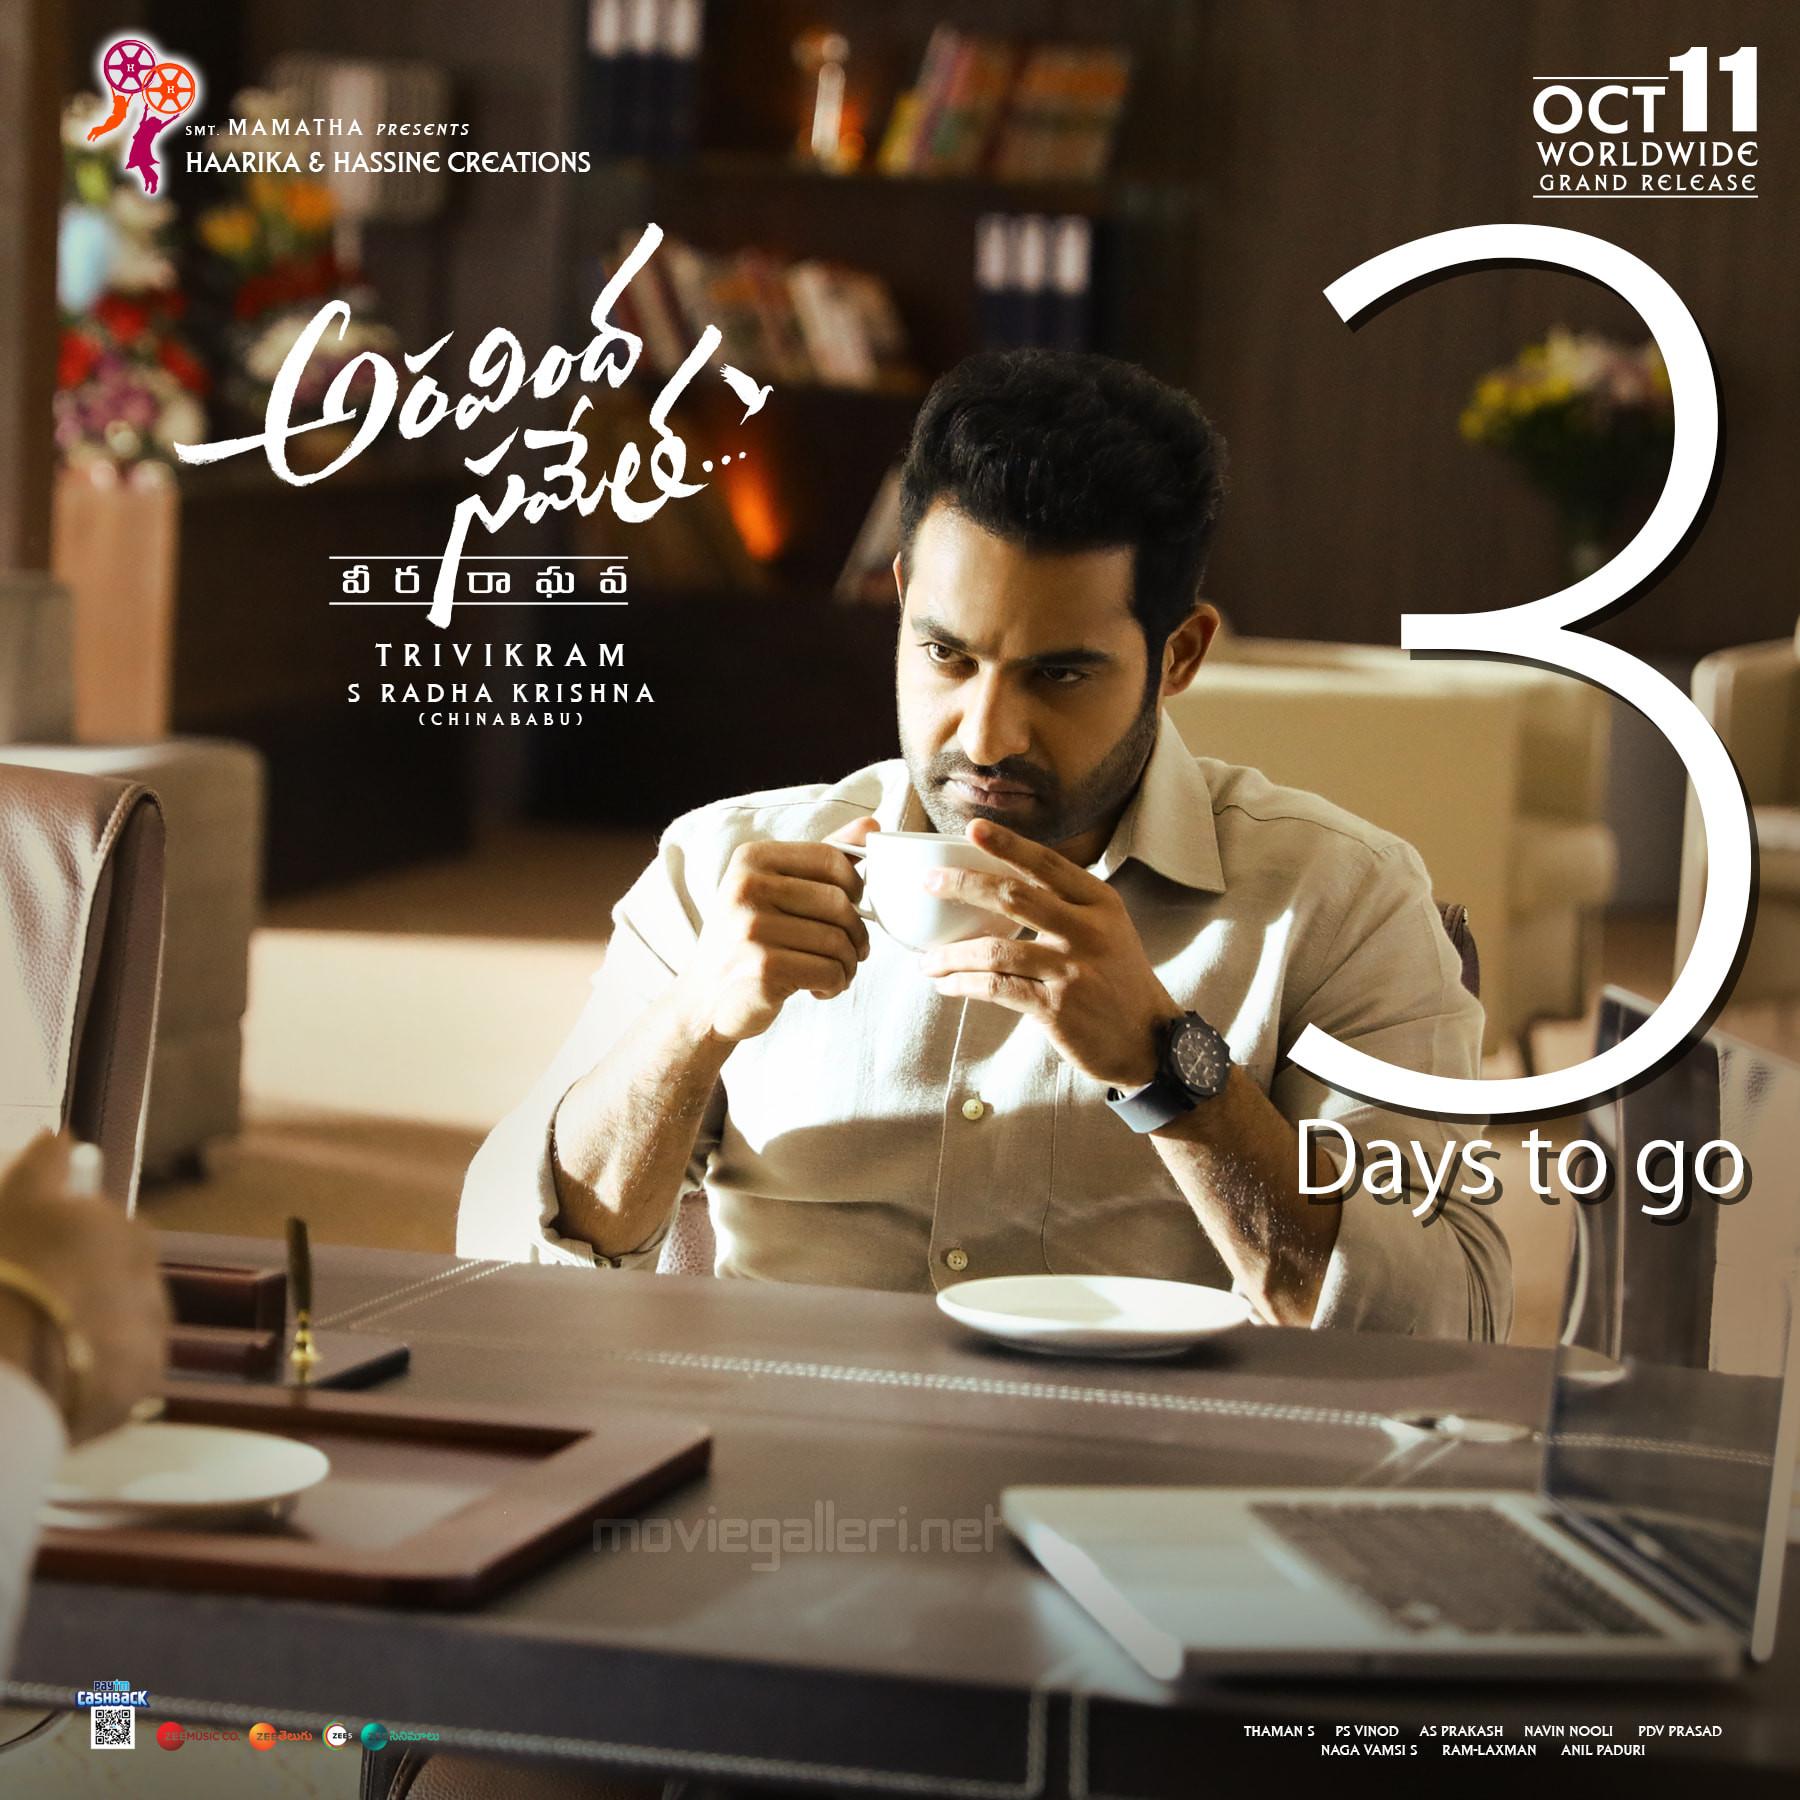 Jr NTR Aravindha Sametha 3 Days to Go Poster HD